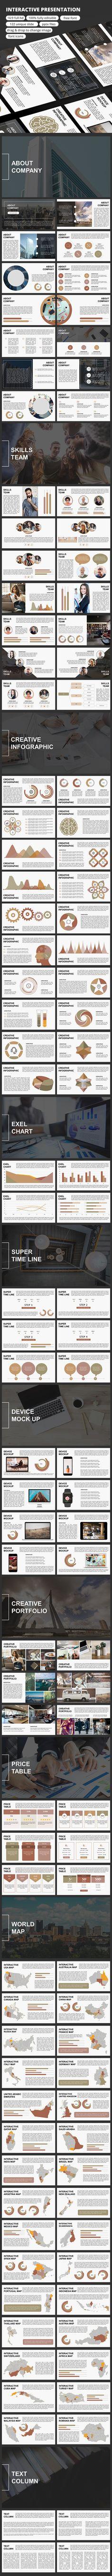 Interactive - PowerPoint Presentation